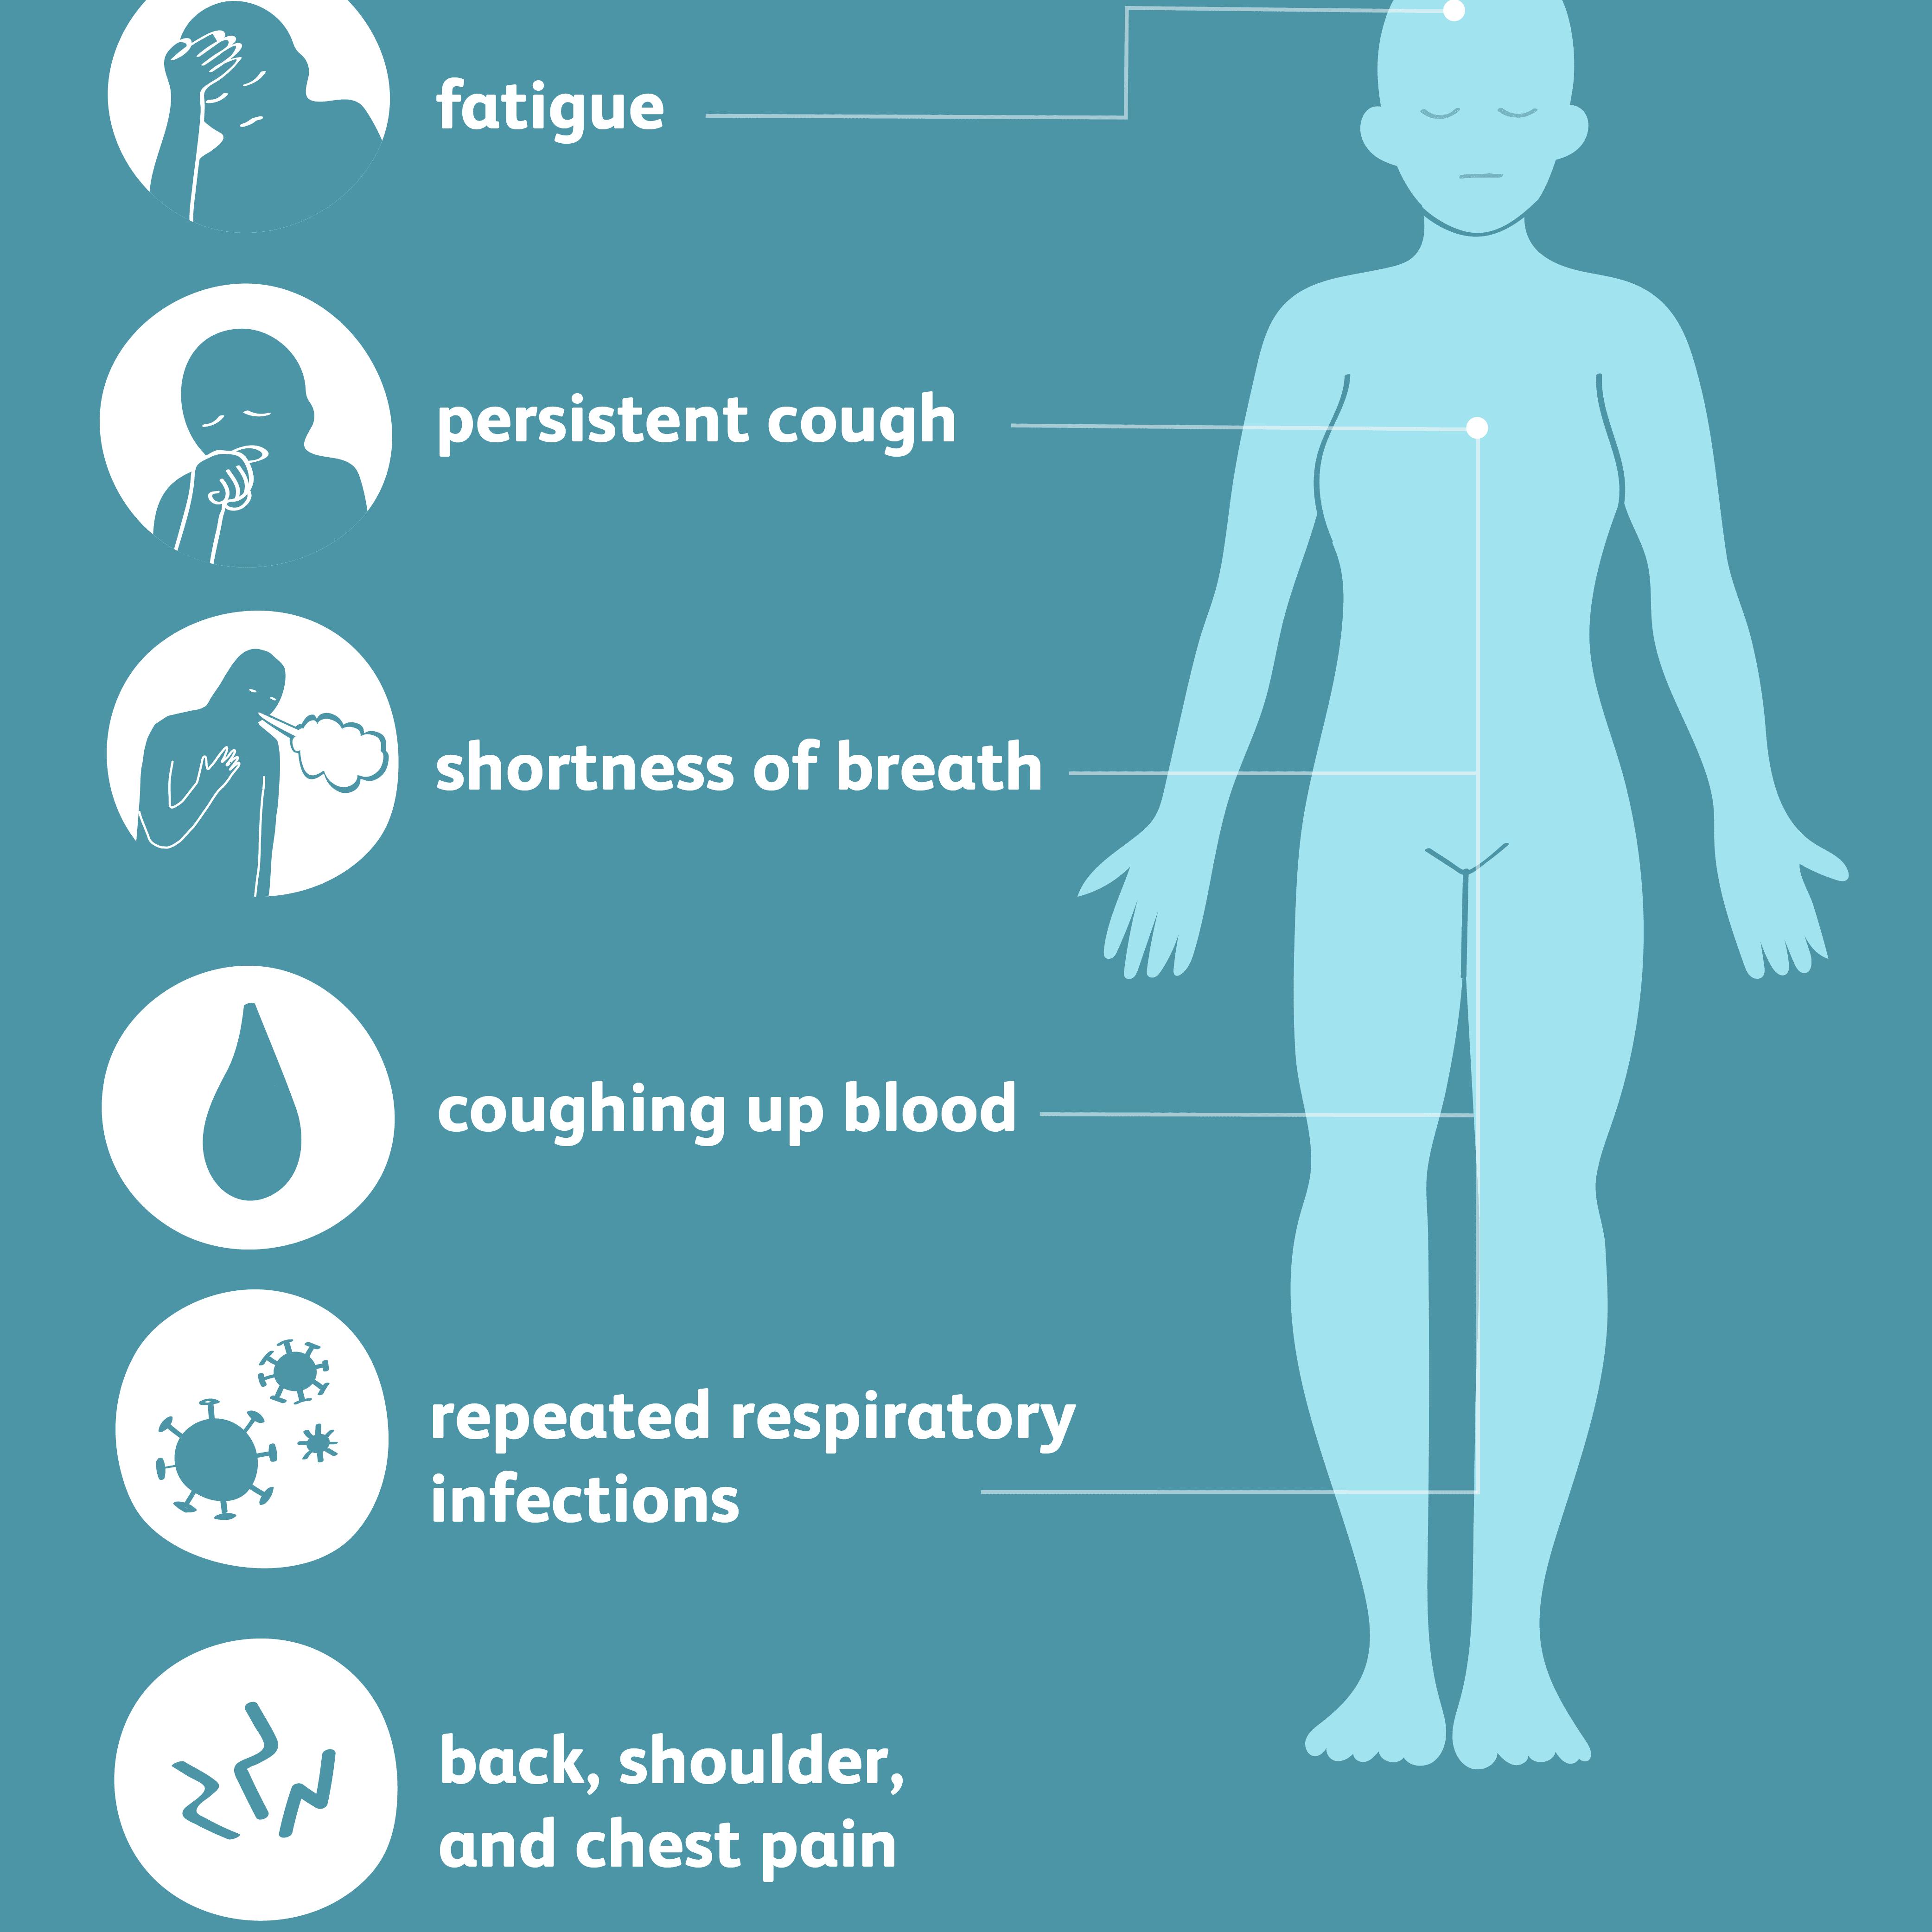 metastatic cancer end of life symptoms